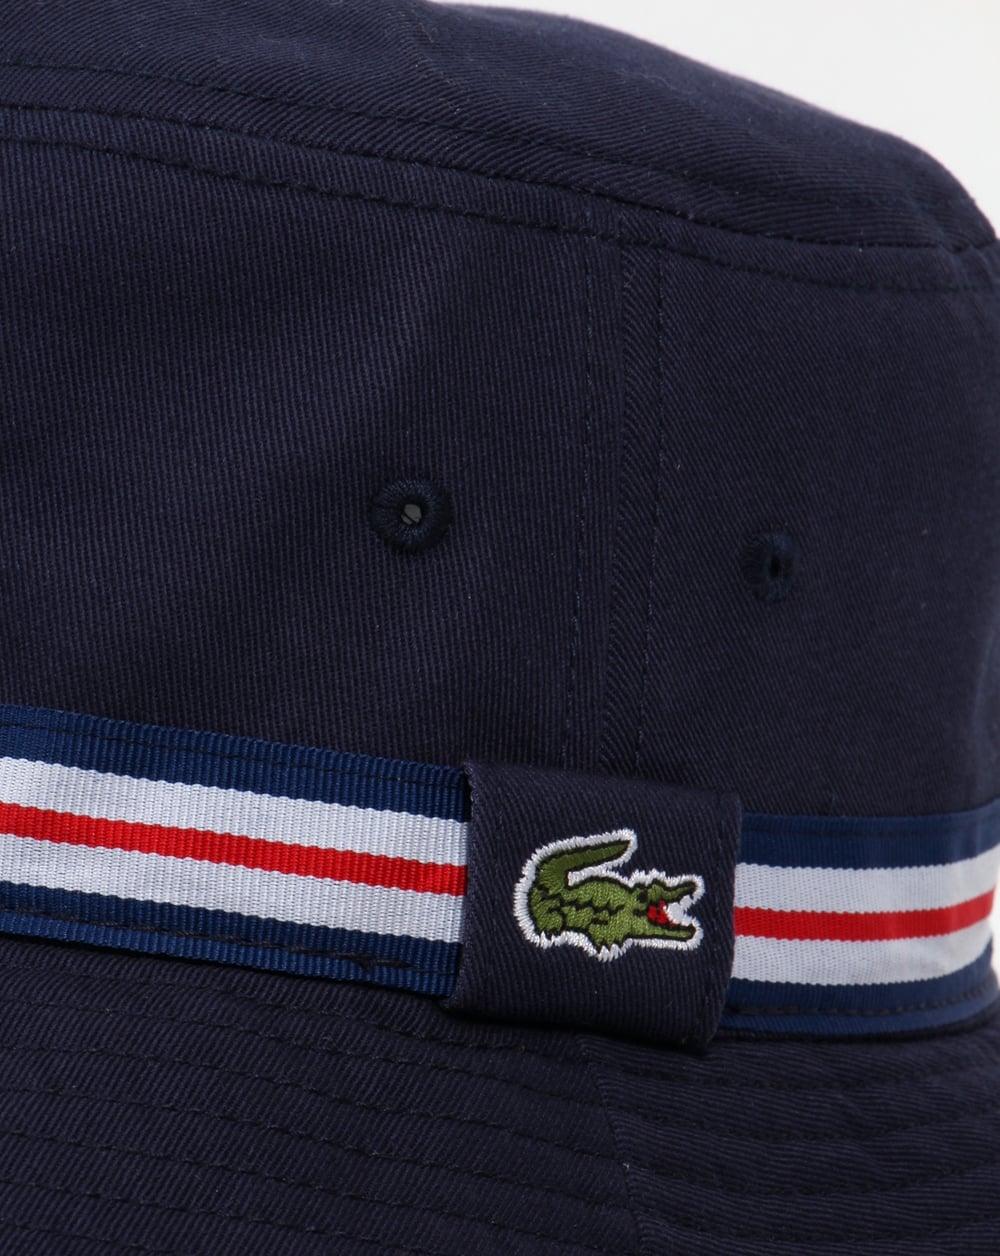 80ba17442597b Lacoste Bucket Sun Hat Navy with trim